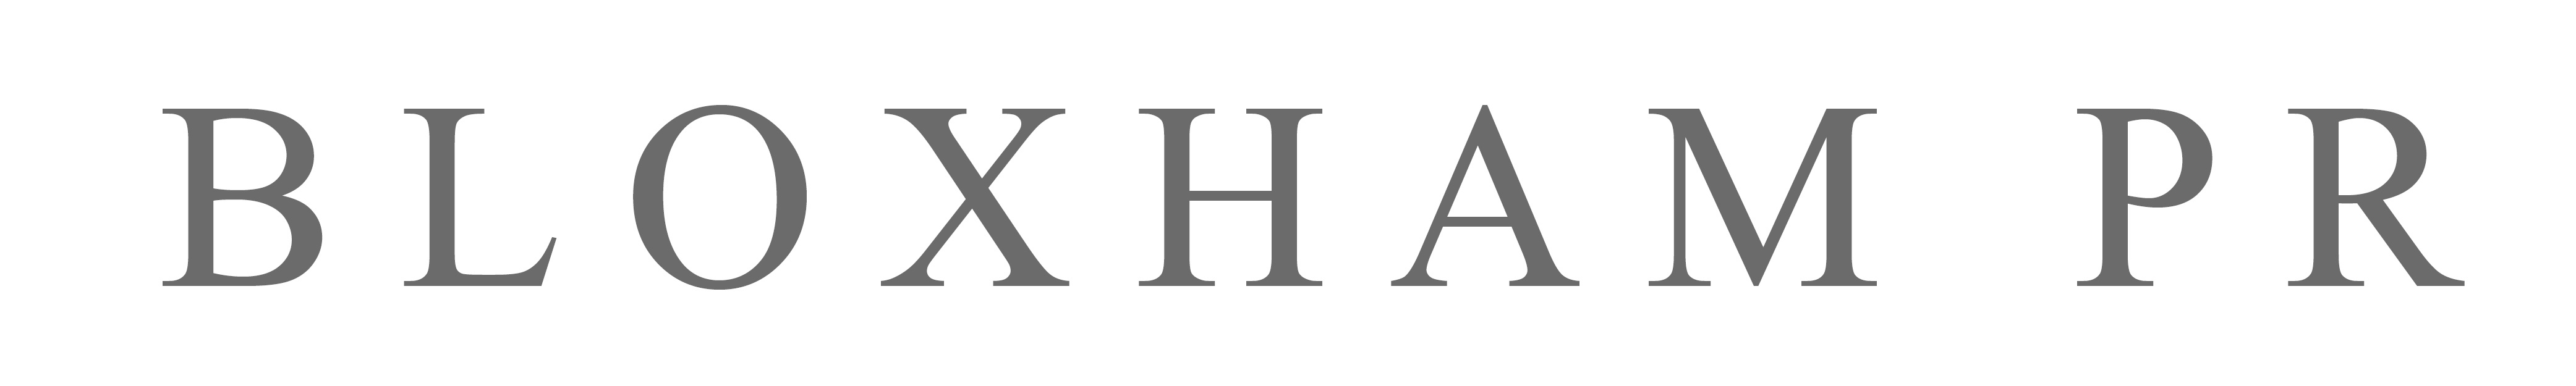 Bloxham PR logo | Randall & Payne, Cheltenham, Gloucestershire